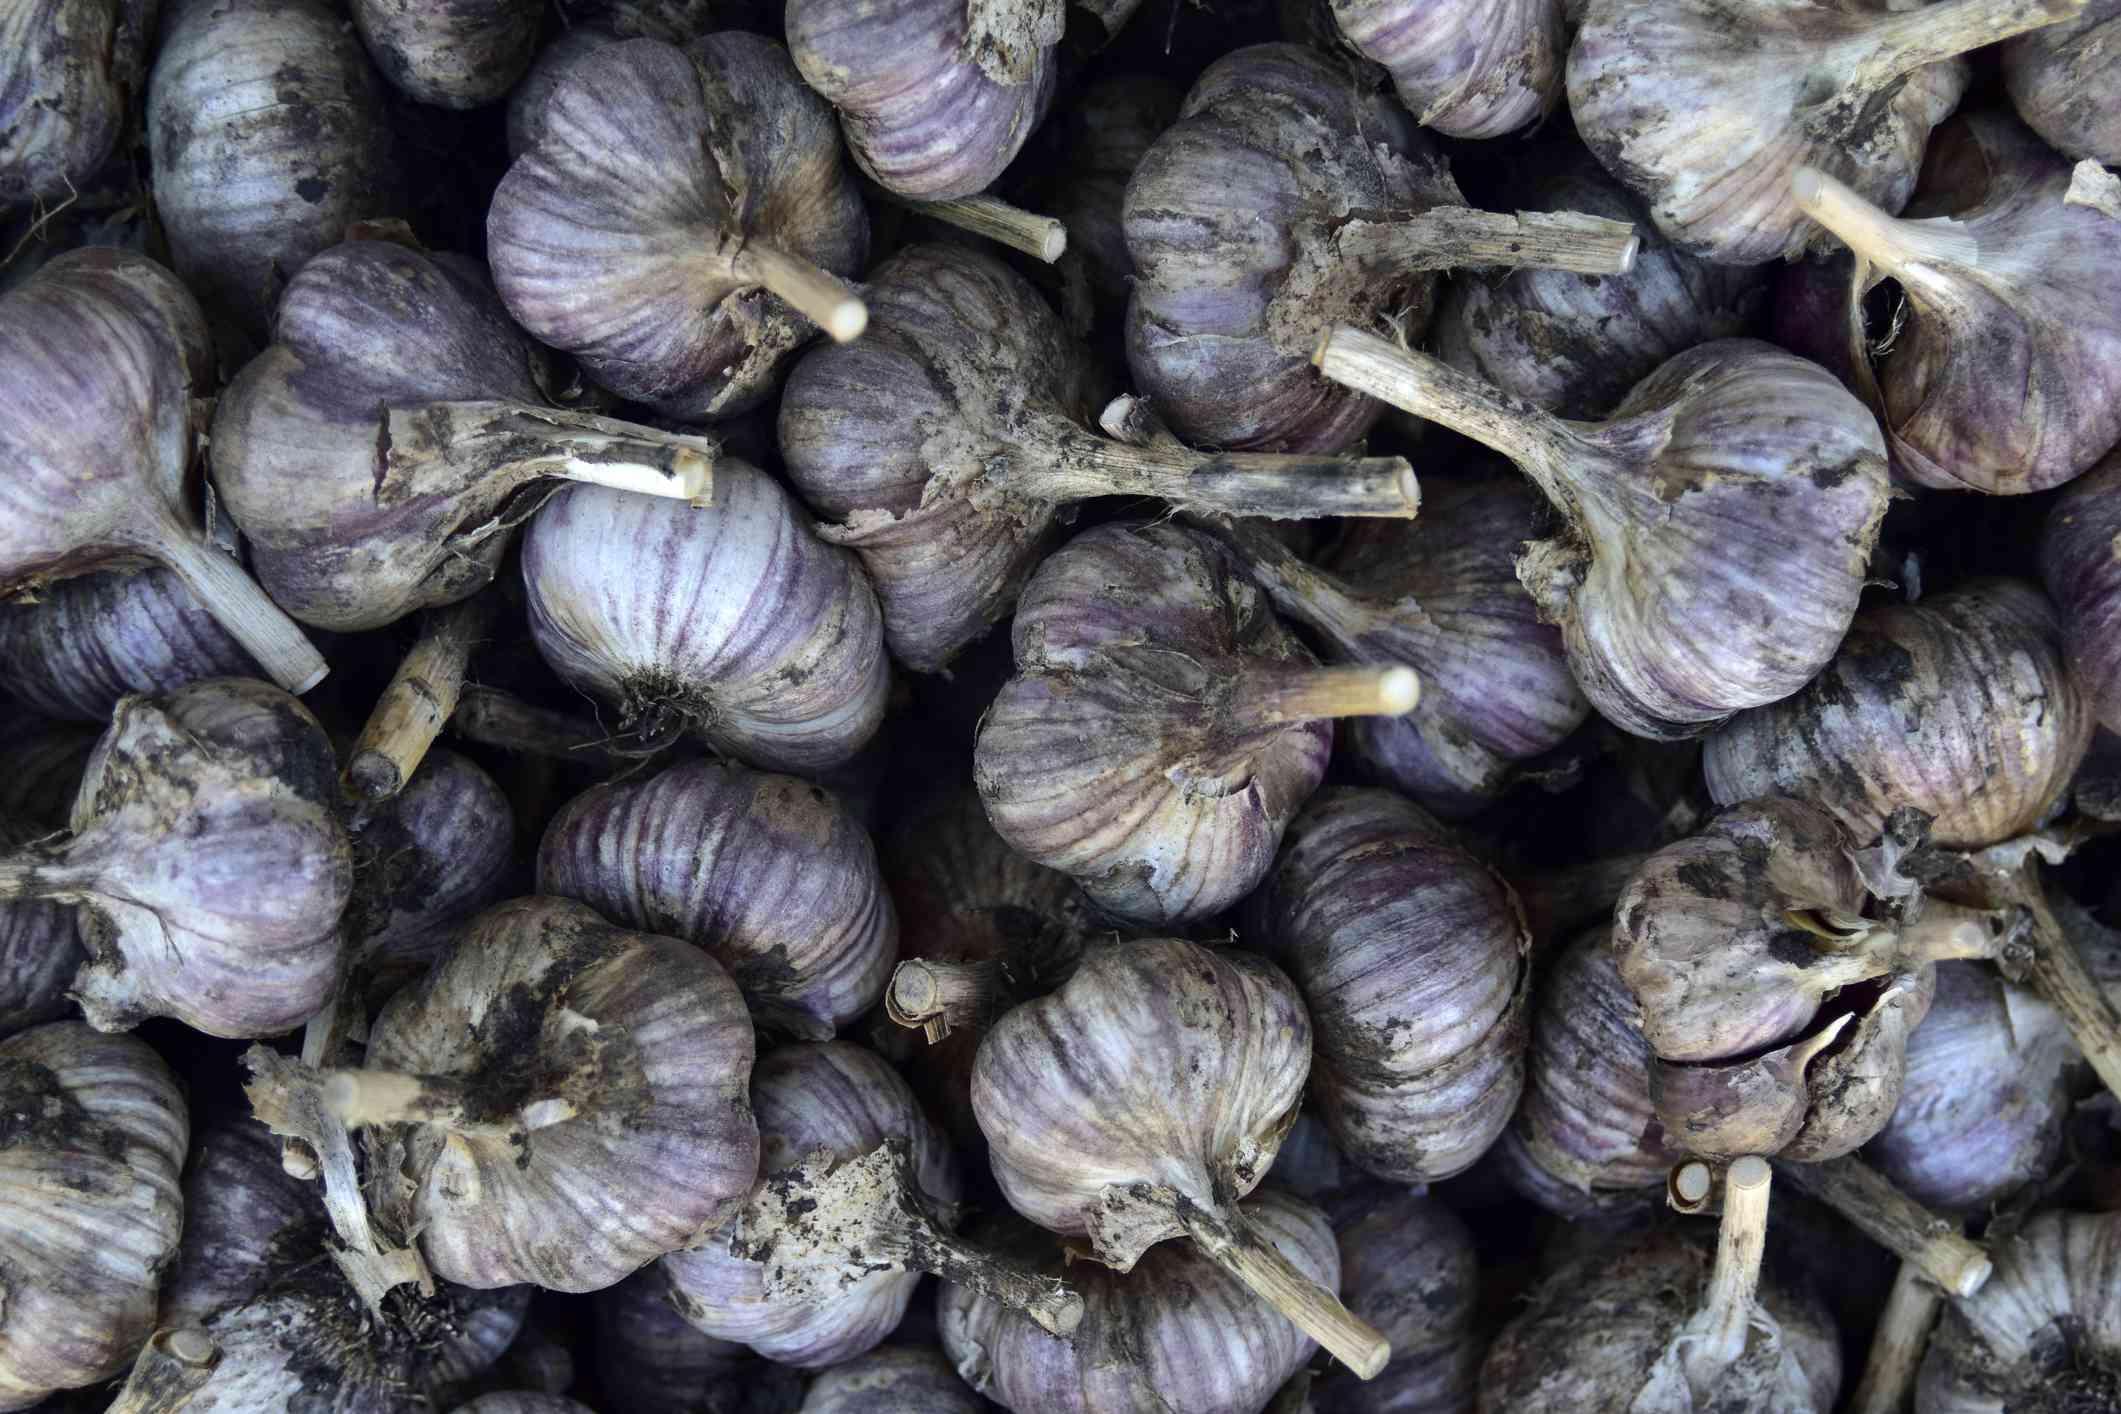 pile of purple garlic bulbs